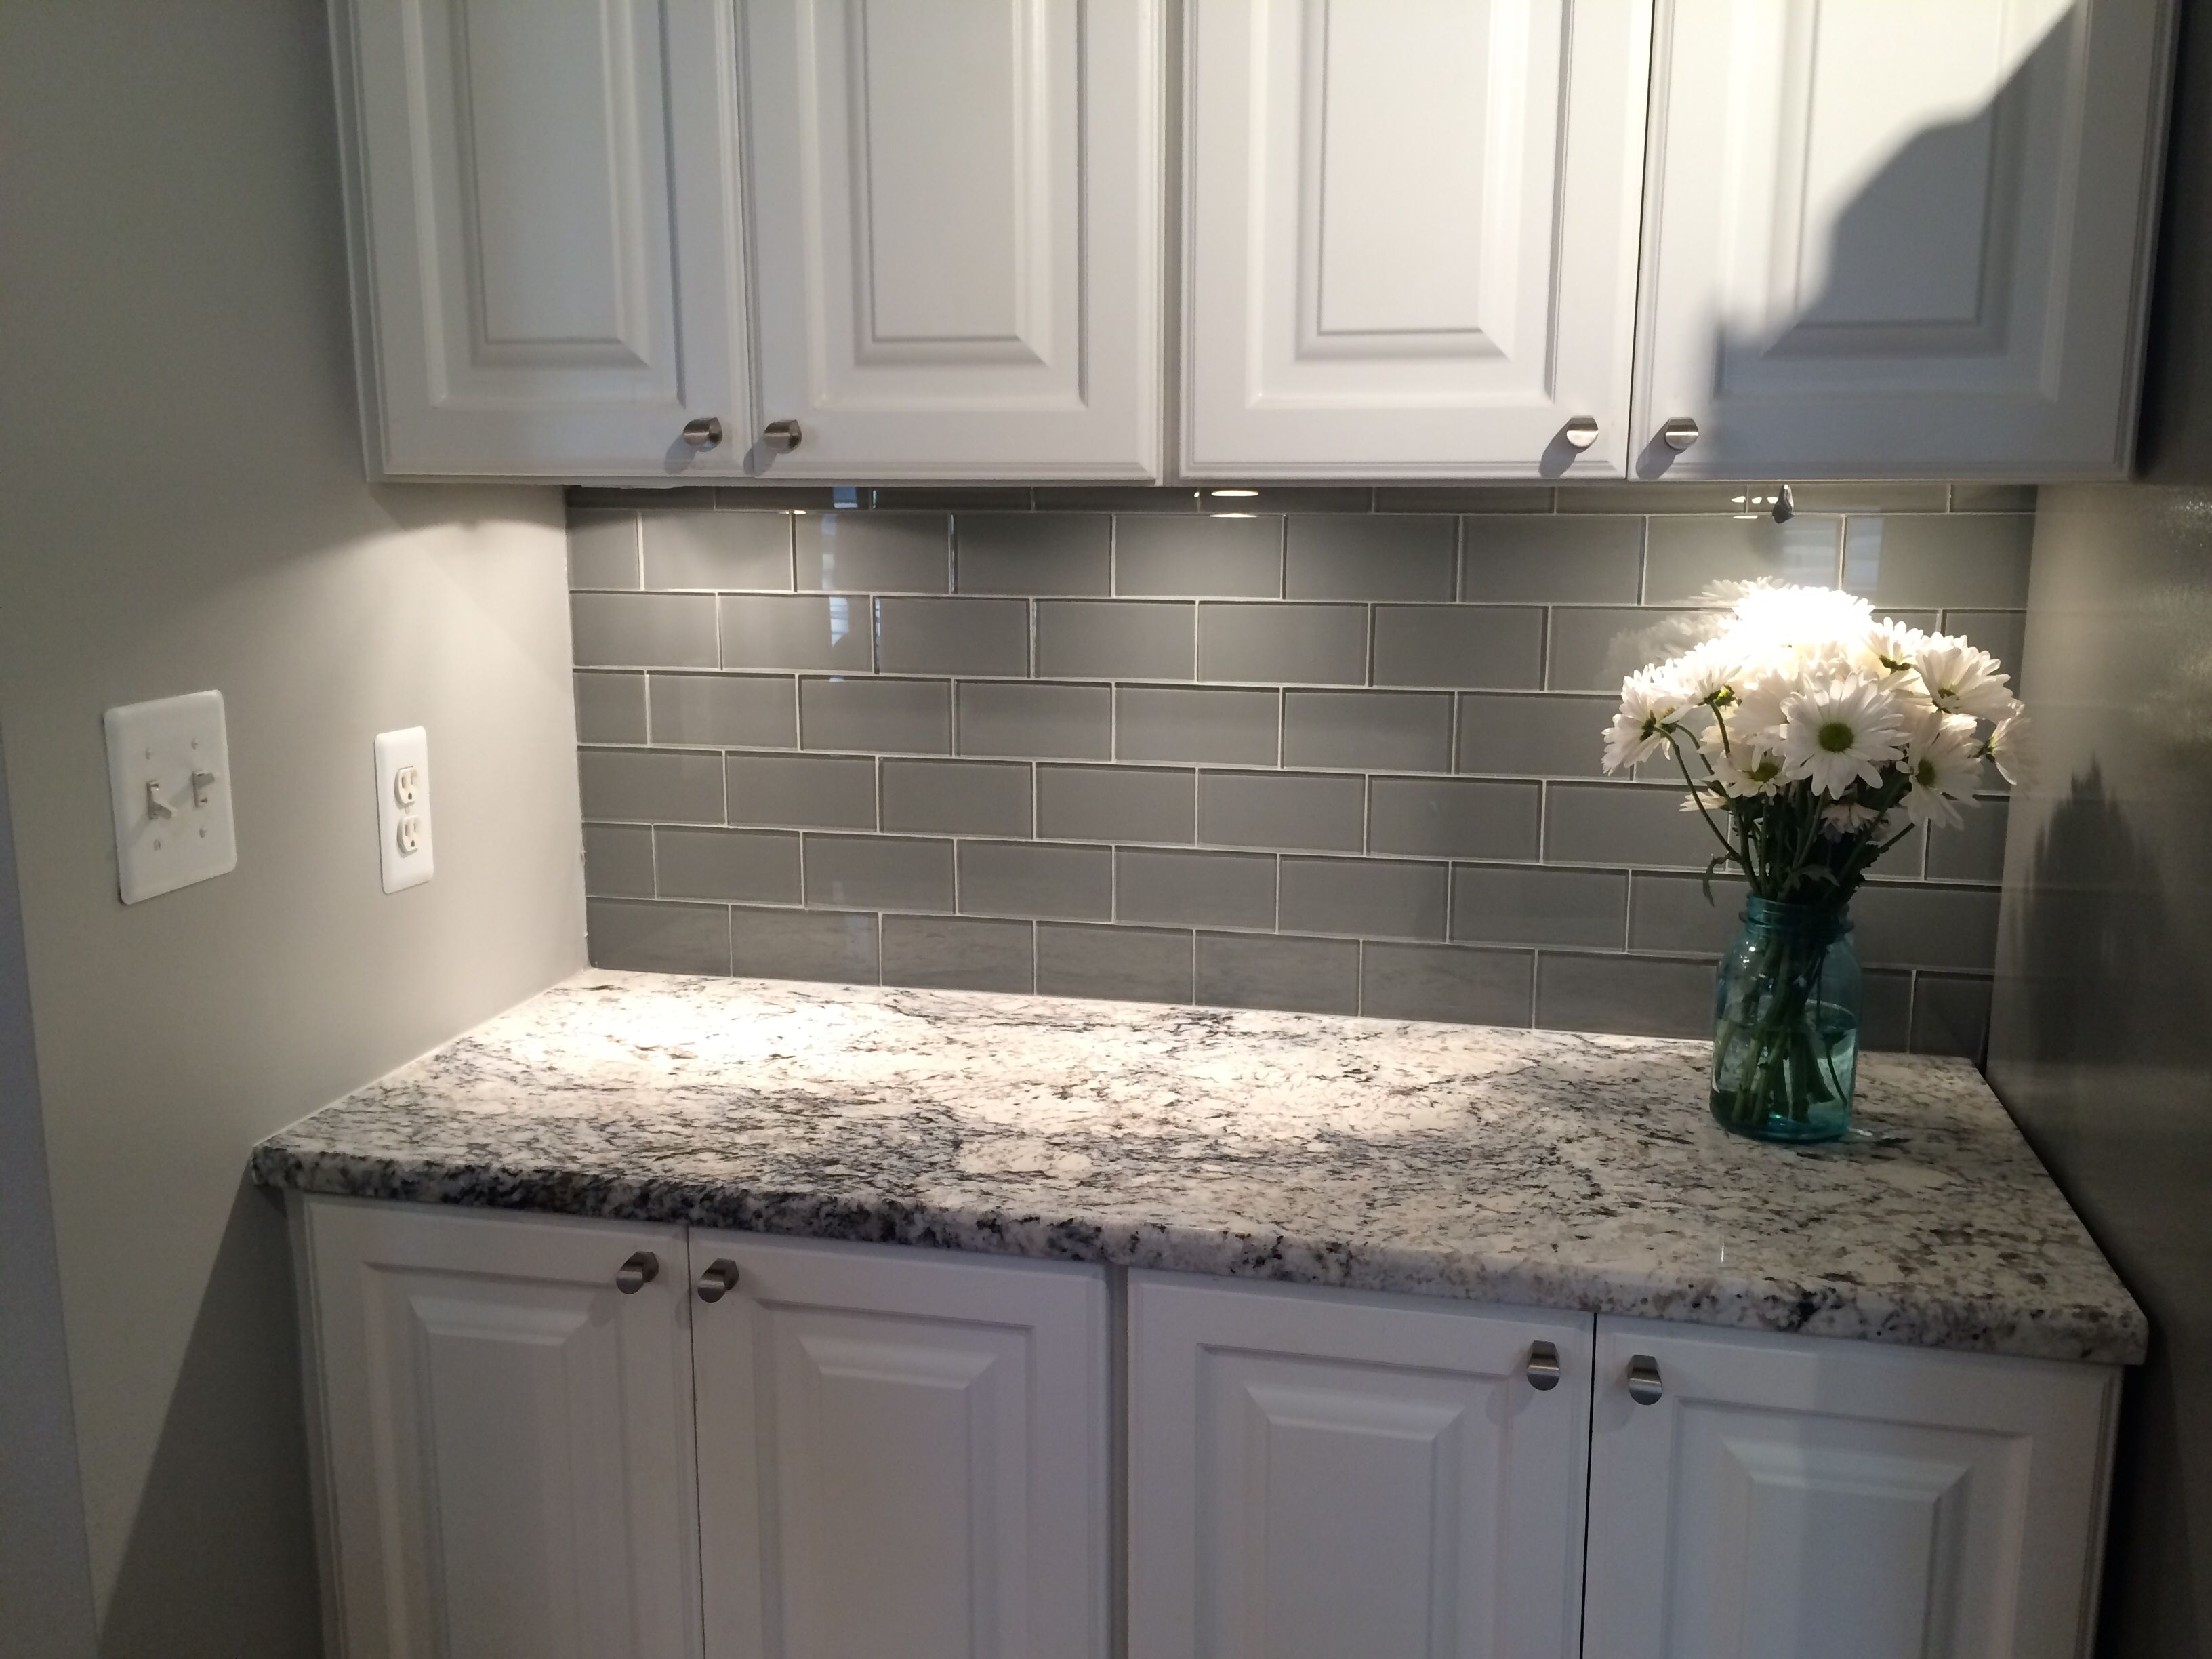 grey kitchen tile costco remodel modern design with azul platino granite countertop white paint cabinet also backsplash for